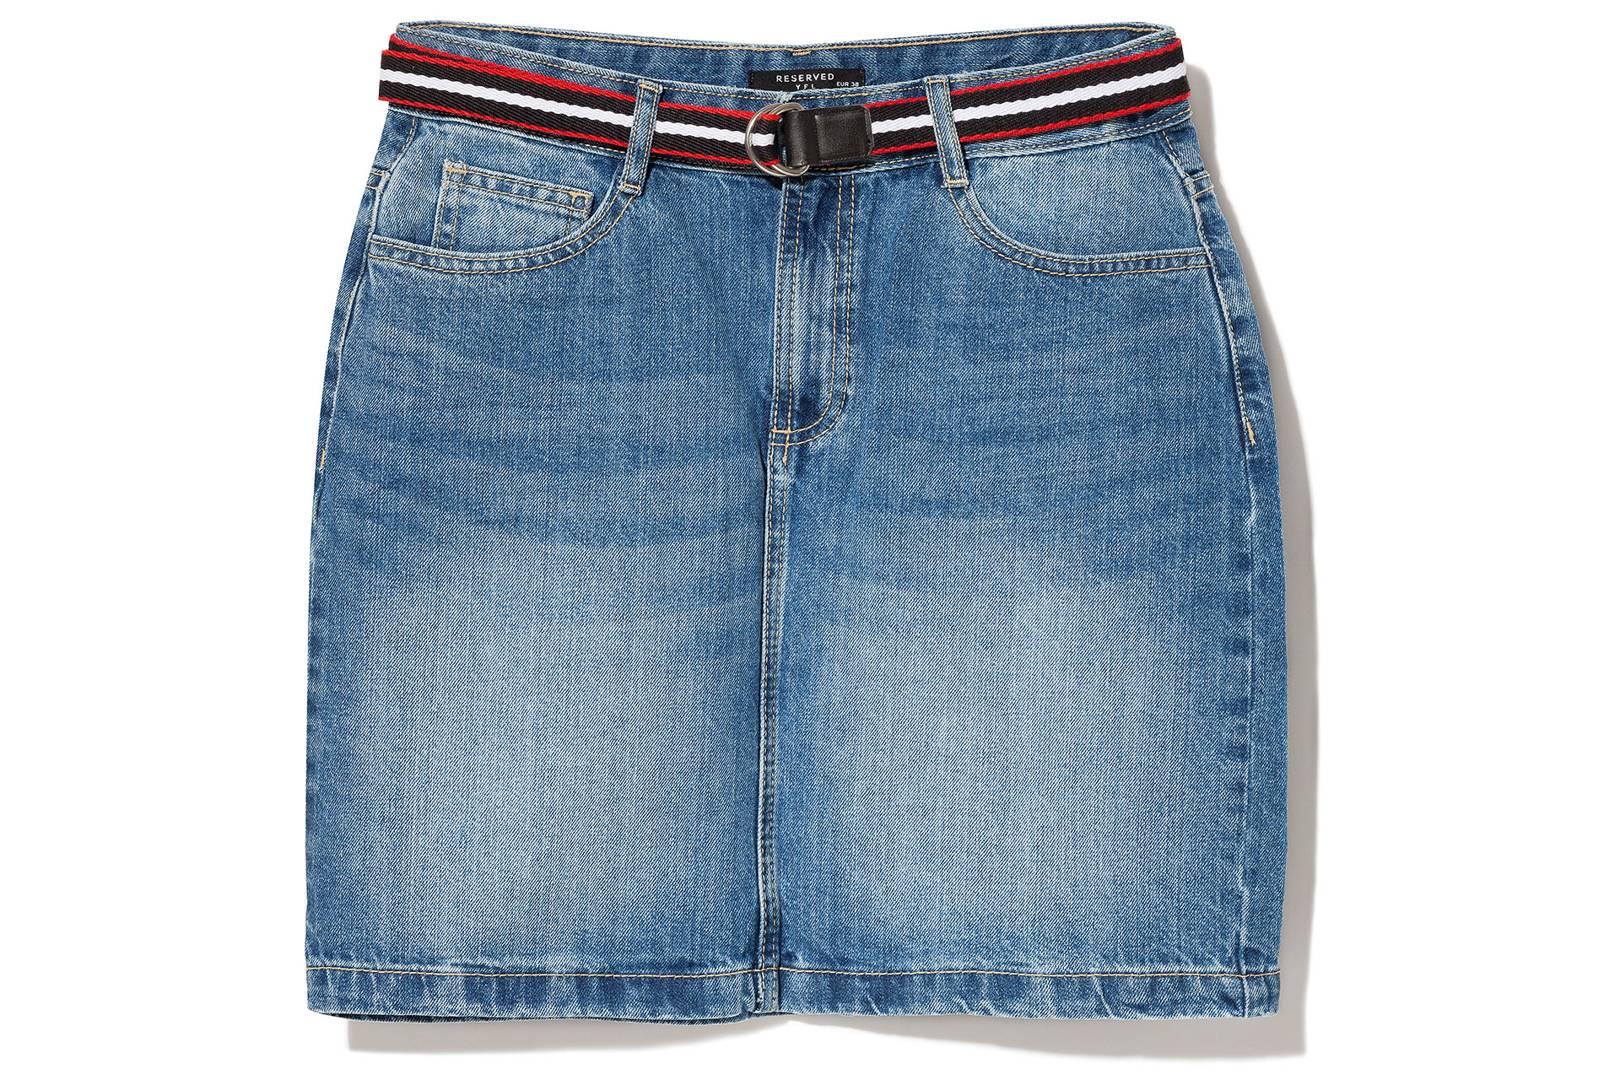 c1231fce4 The best denim skirts to buy right now | British Vogue